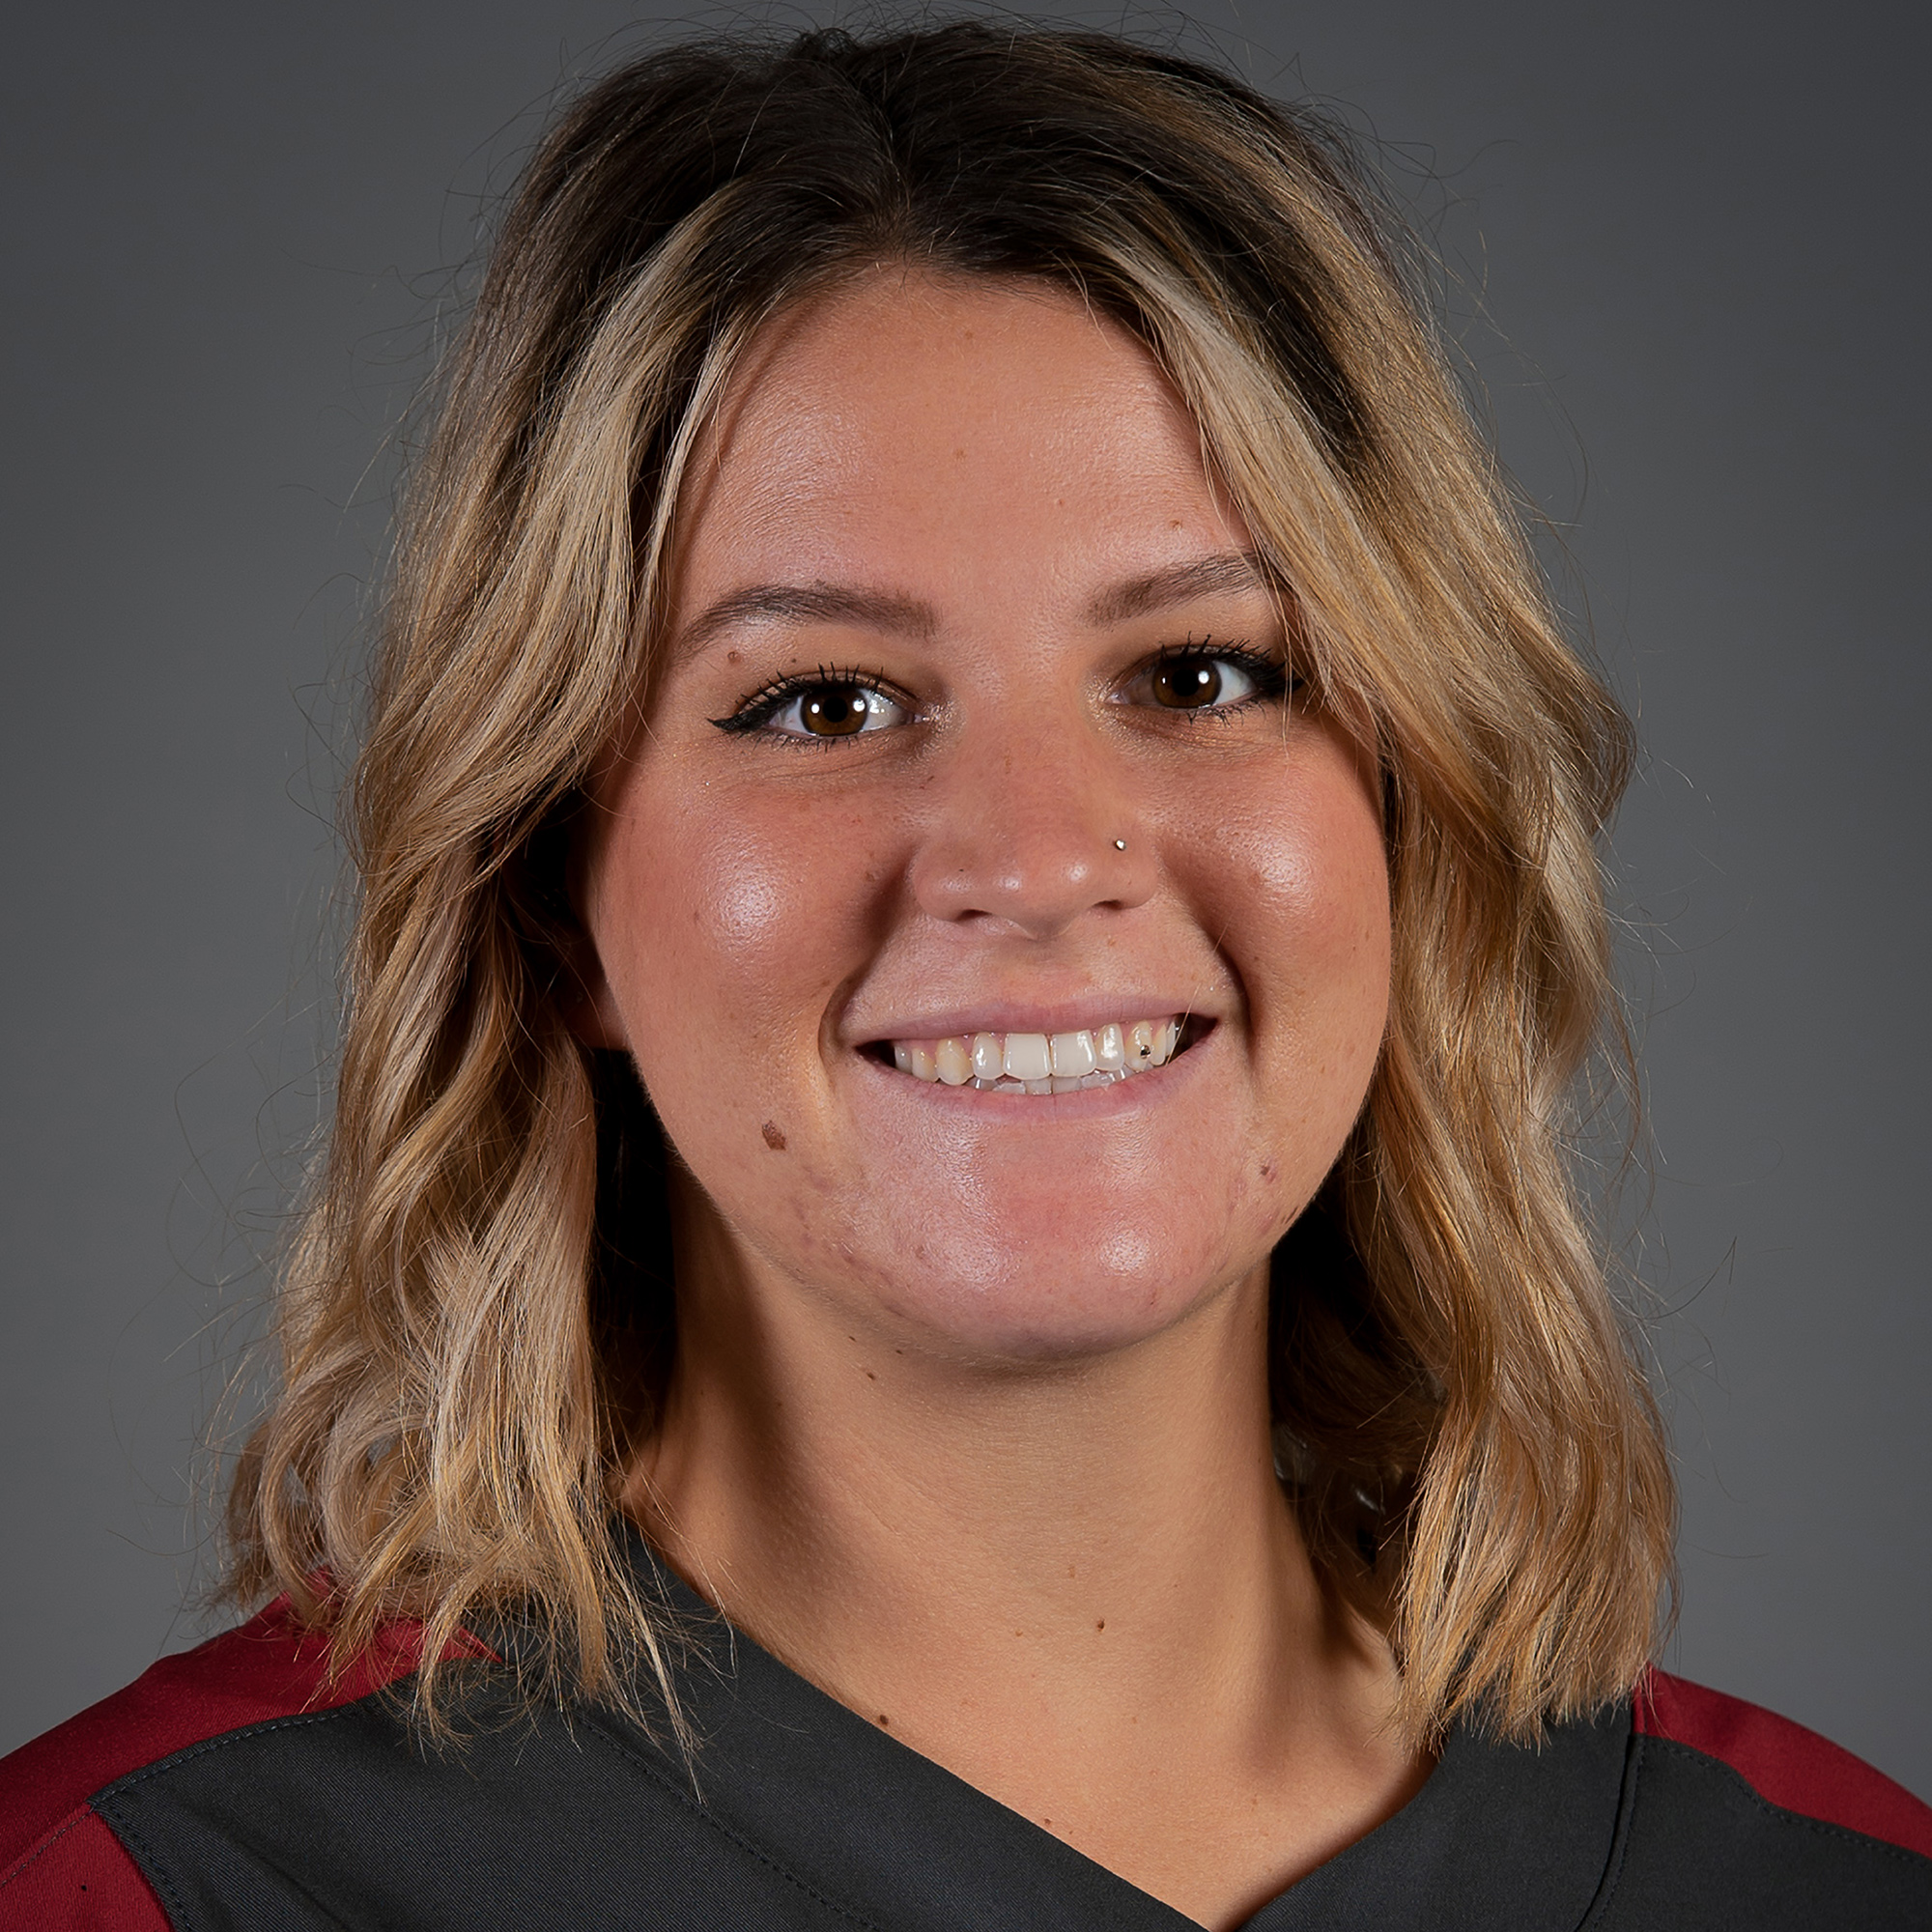 Linnie Malkin - Softball - Arkansas Razorbacks